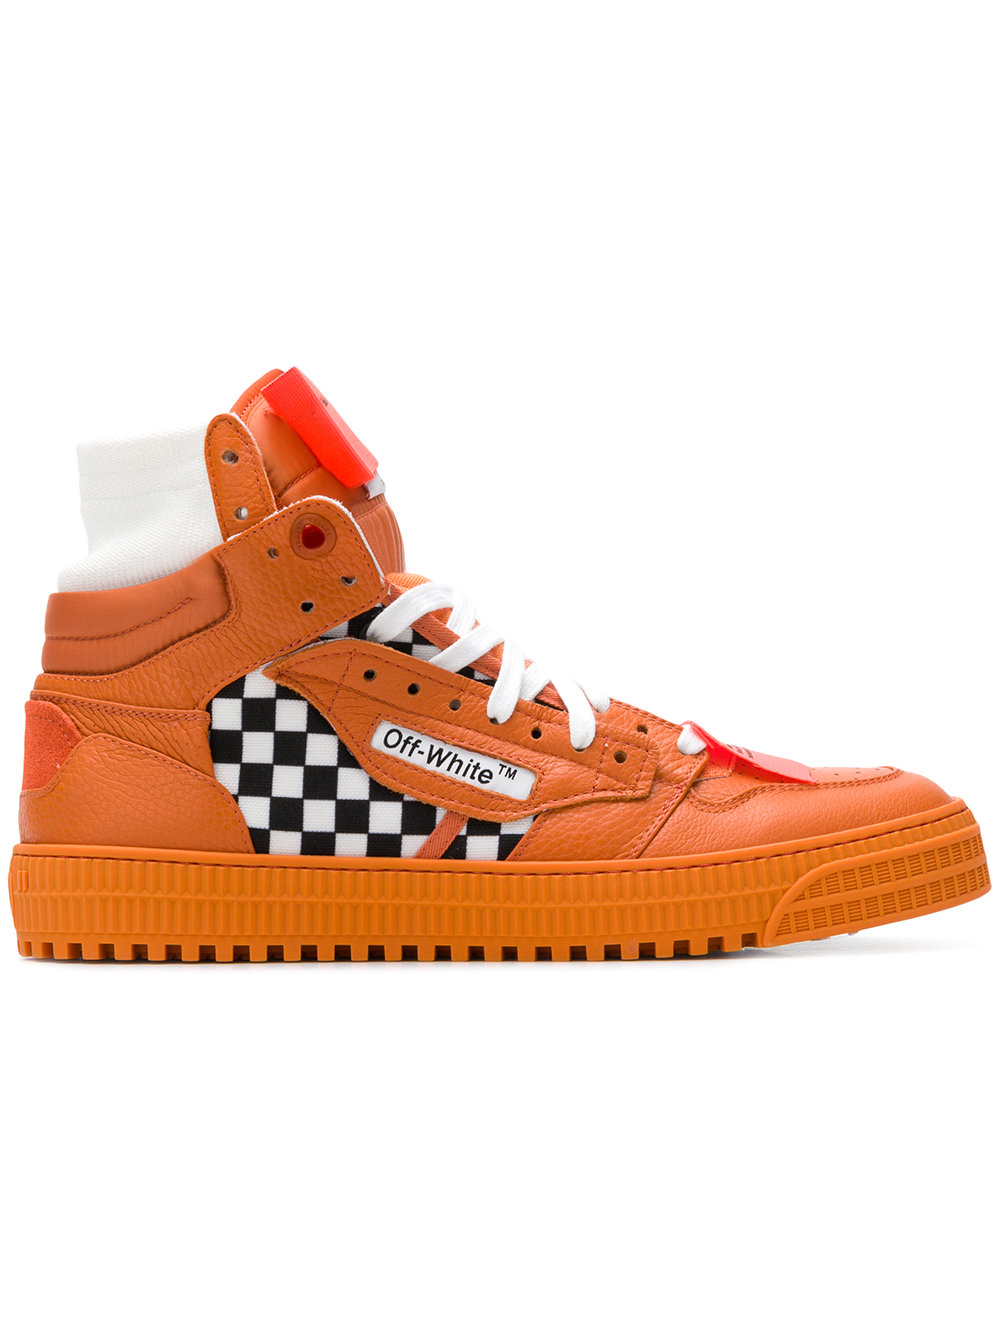 Off-White   Orange Low 3.0 Sneaker